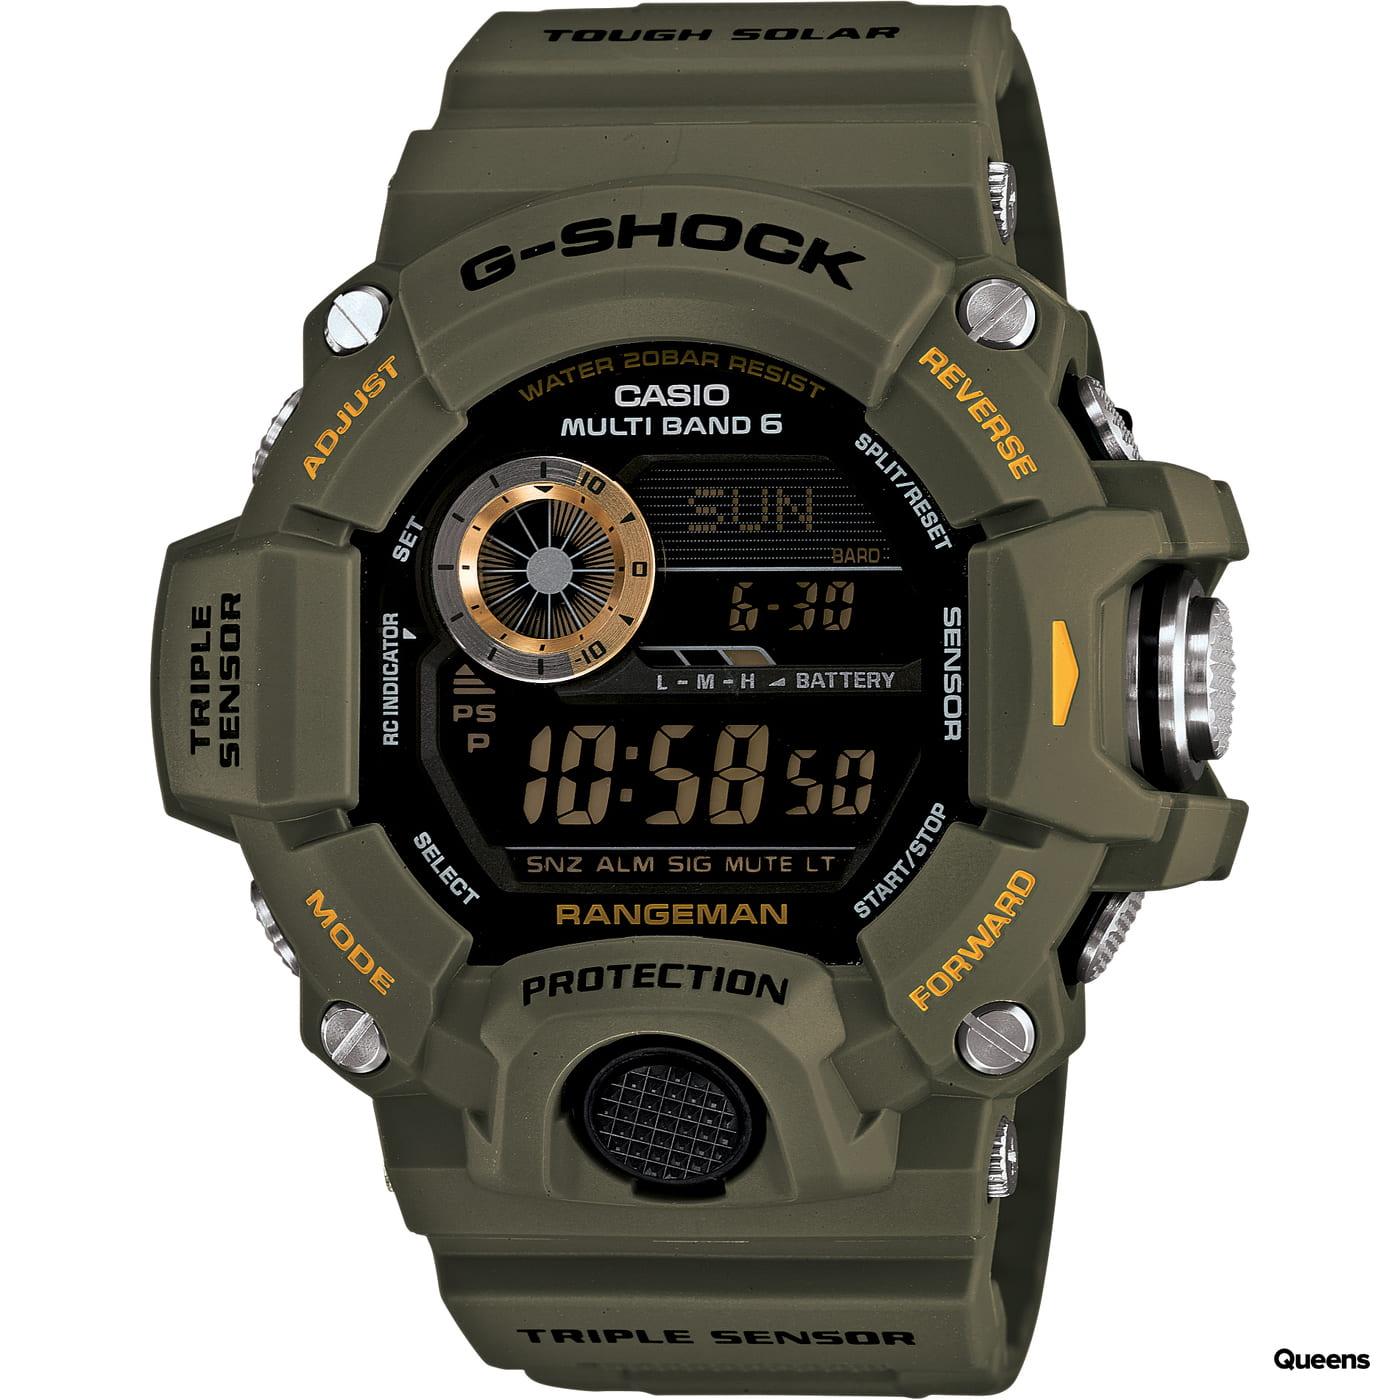 Casio G-Shock GW 9400-3ER olive